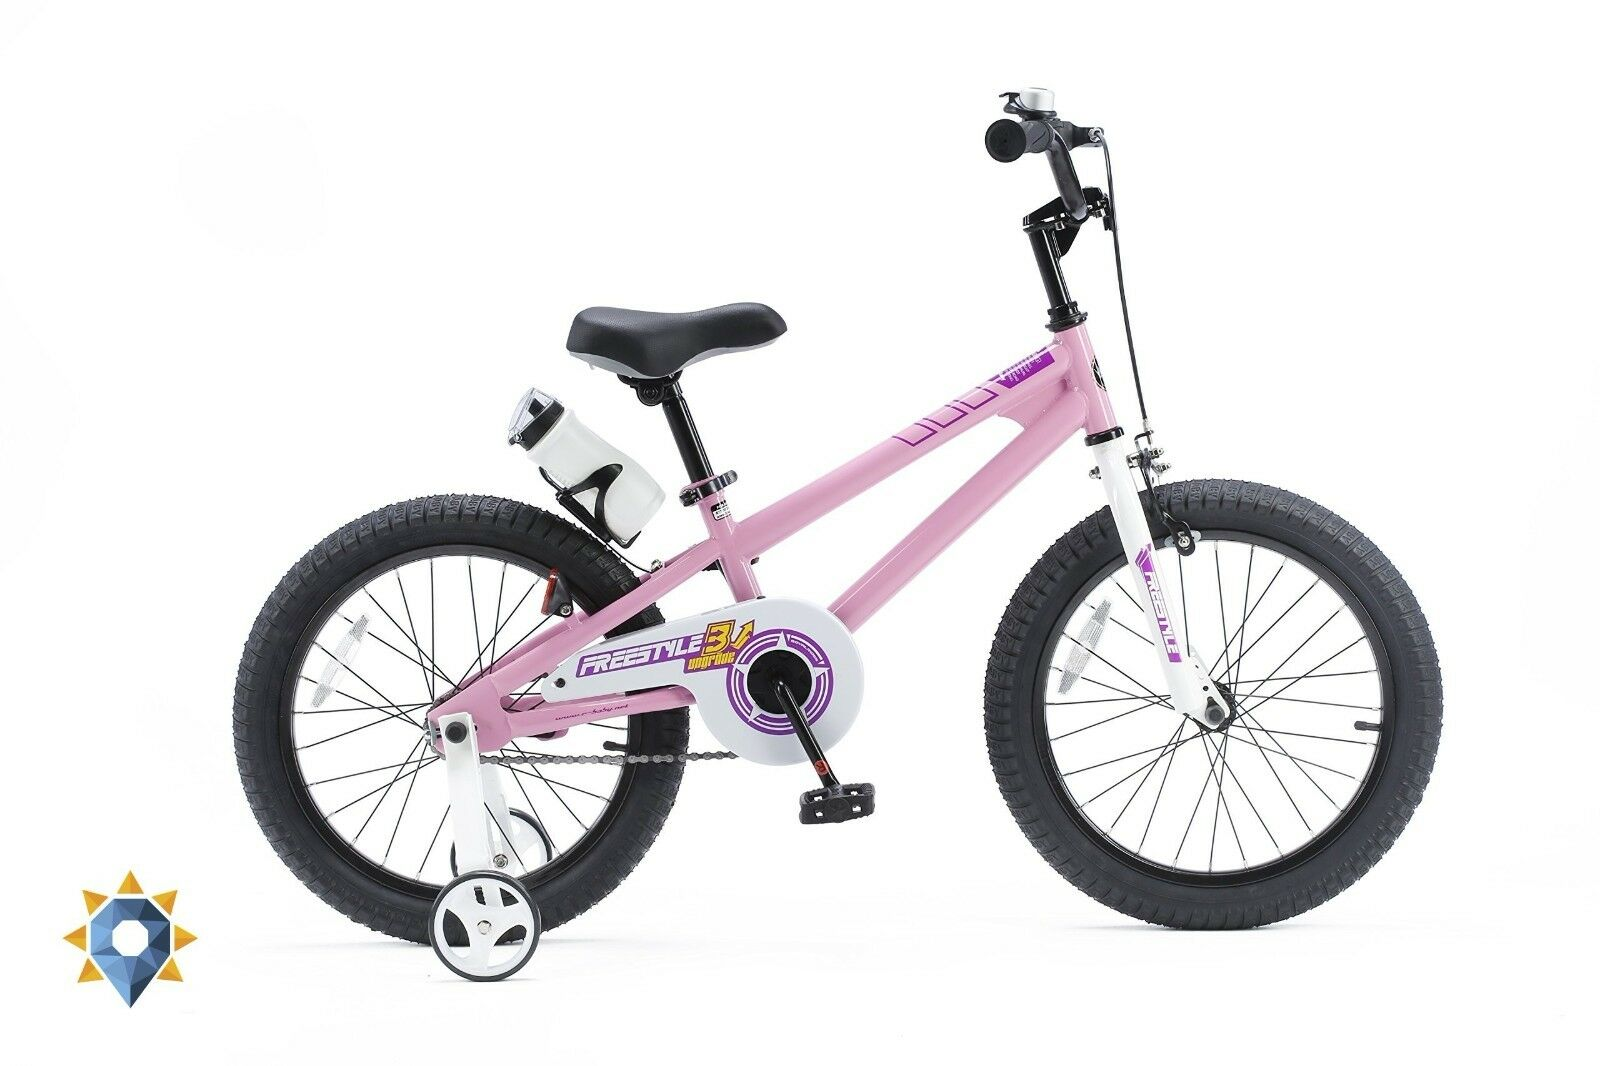 Kids Bike 18 Inch Girls Hot Pink Bmx Bicycle Training Wheels Freestyle RoyalBaby